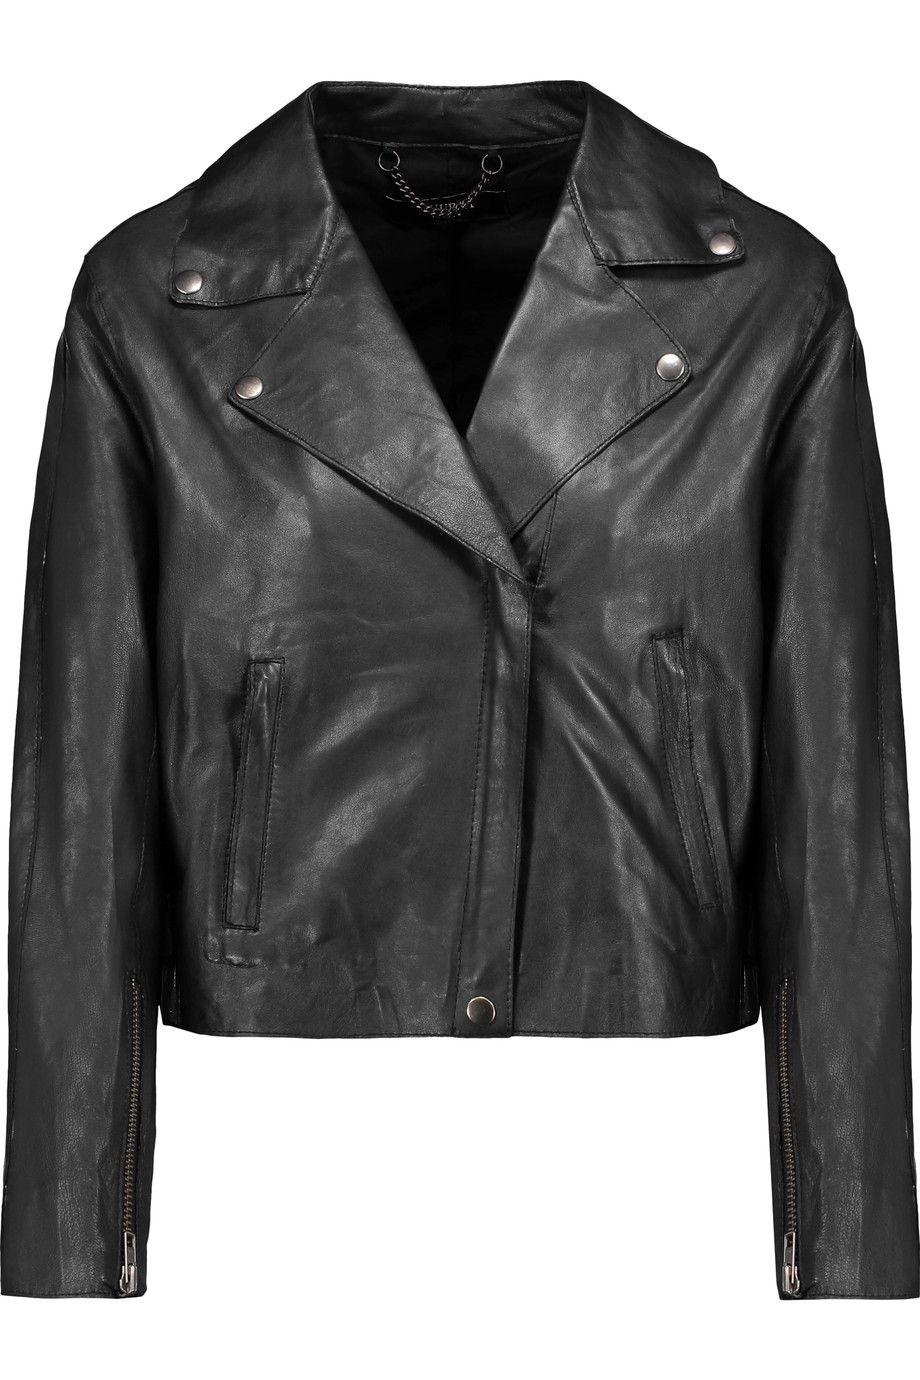 Muubaa Muubaa Cloth Jacket Biker Jacket Leather Women Leather Biker Jacket [ 1380 x 920 Pixel ]